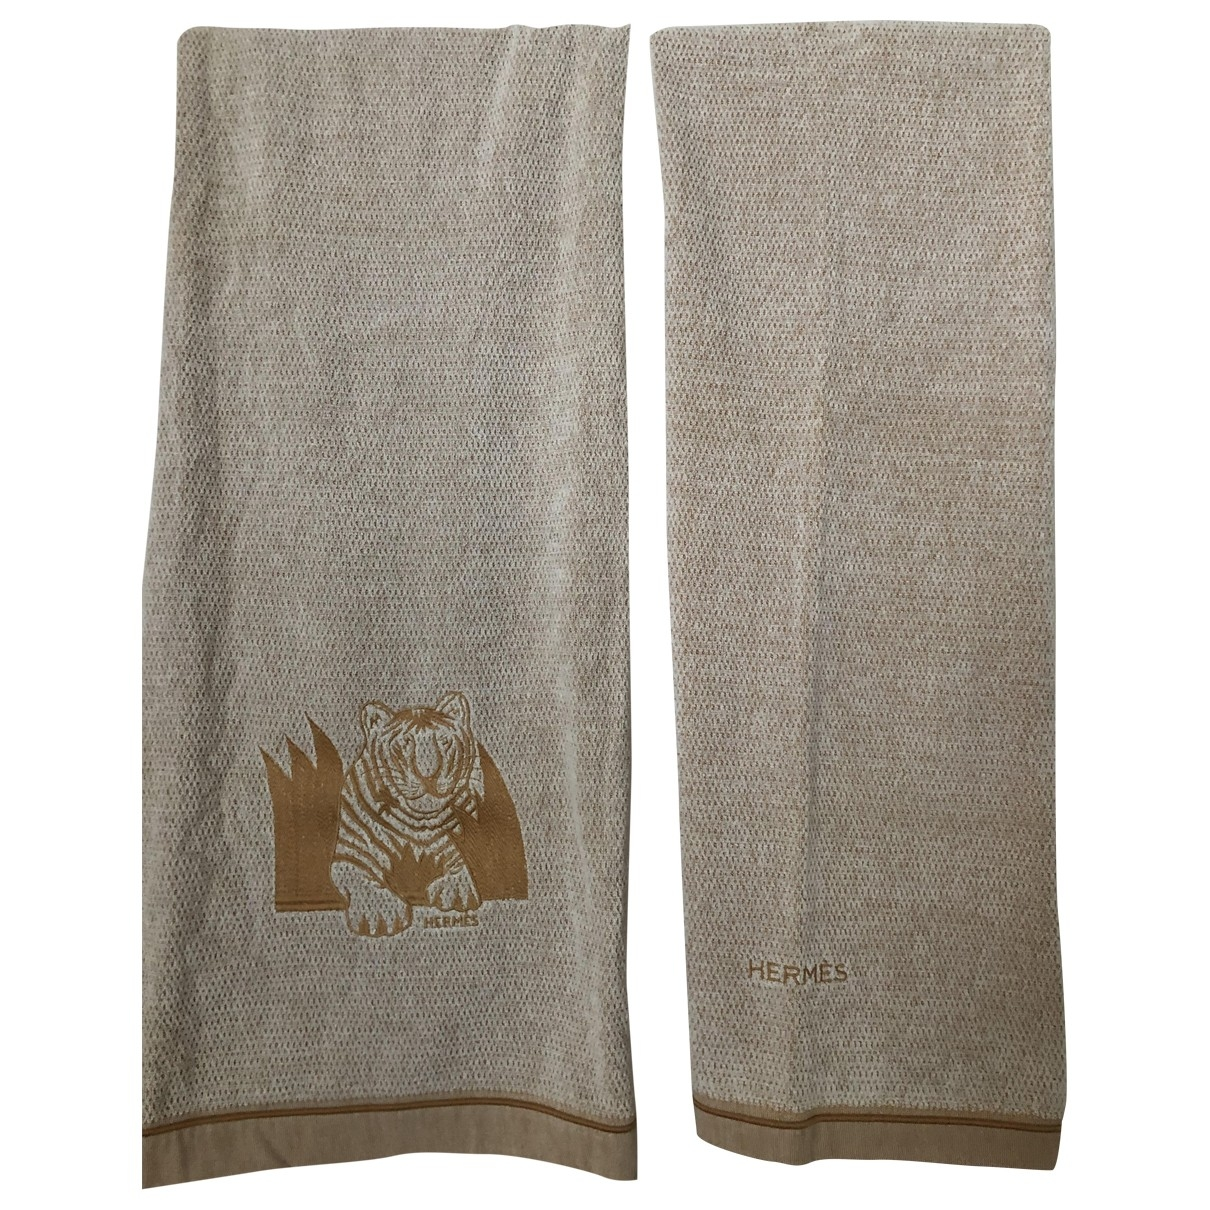 Textil de hogar Tigre Royal Hermes